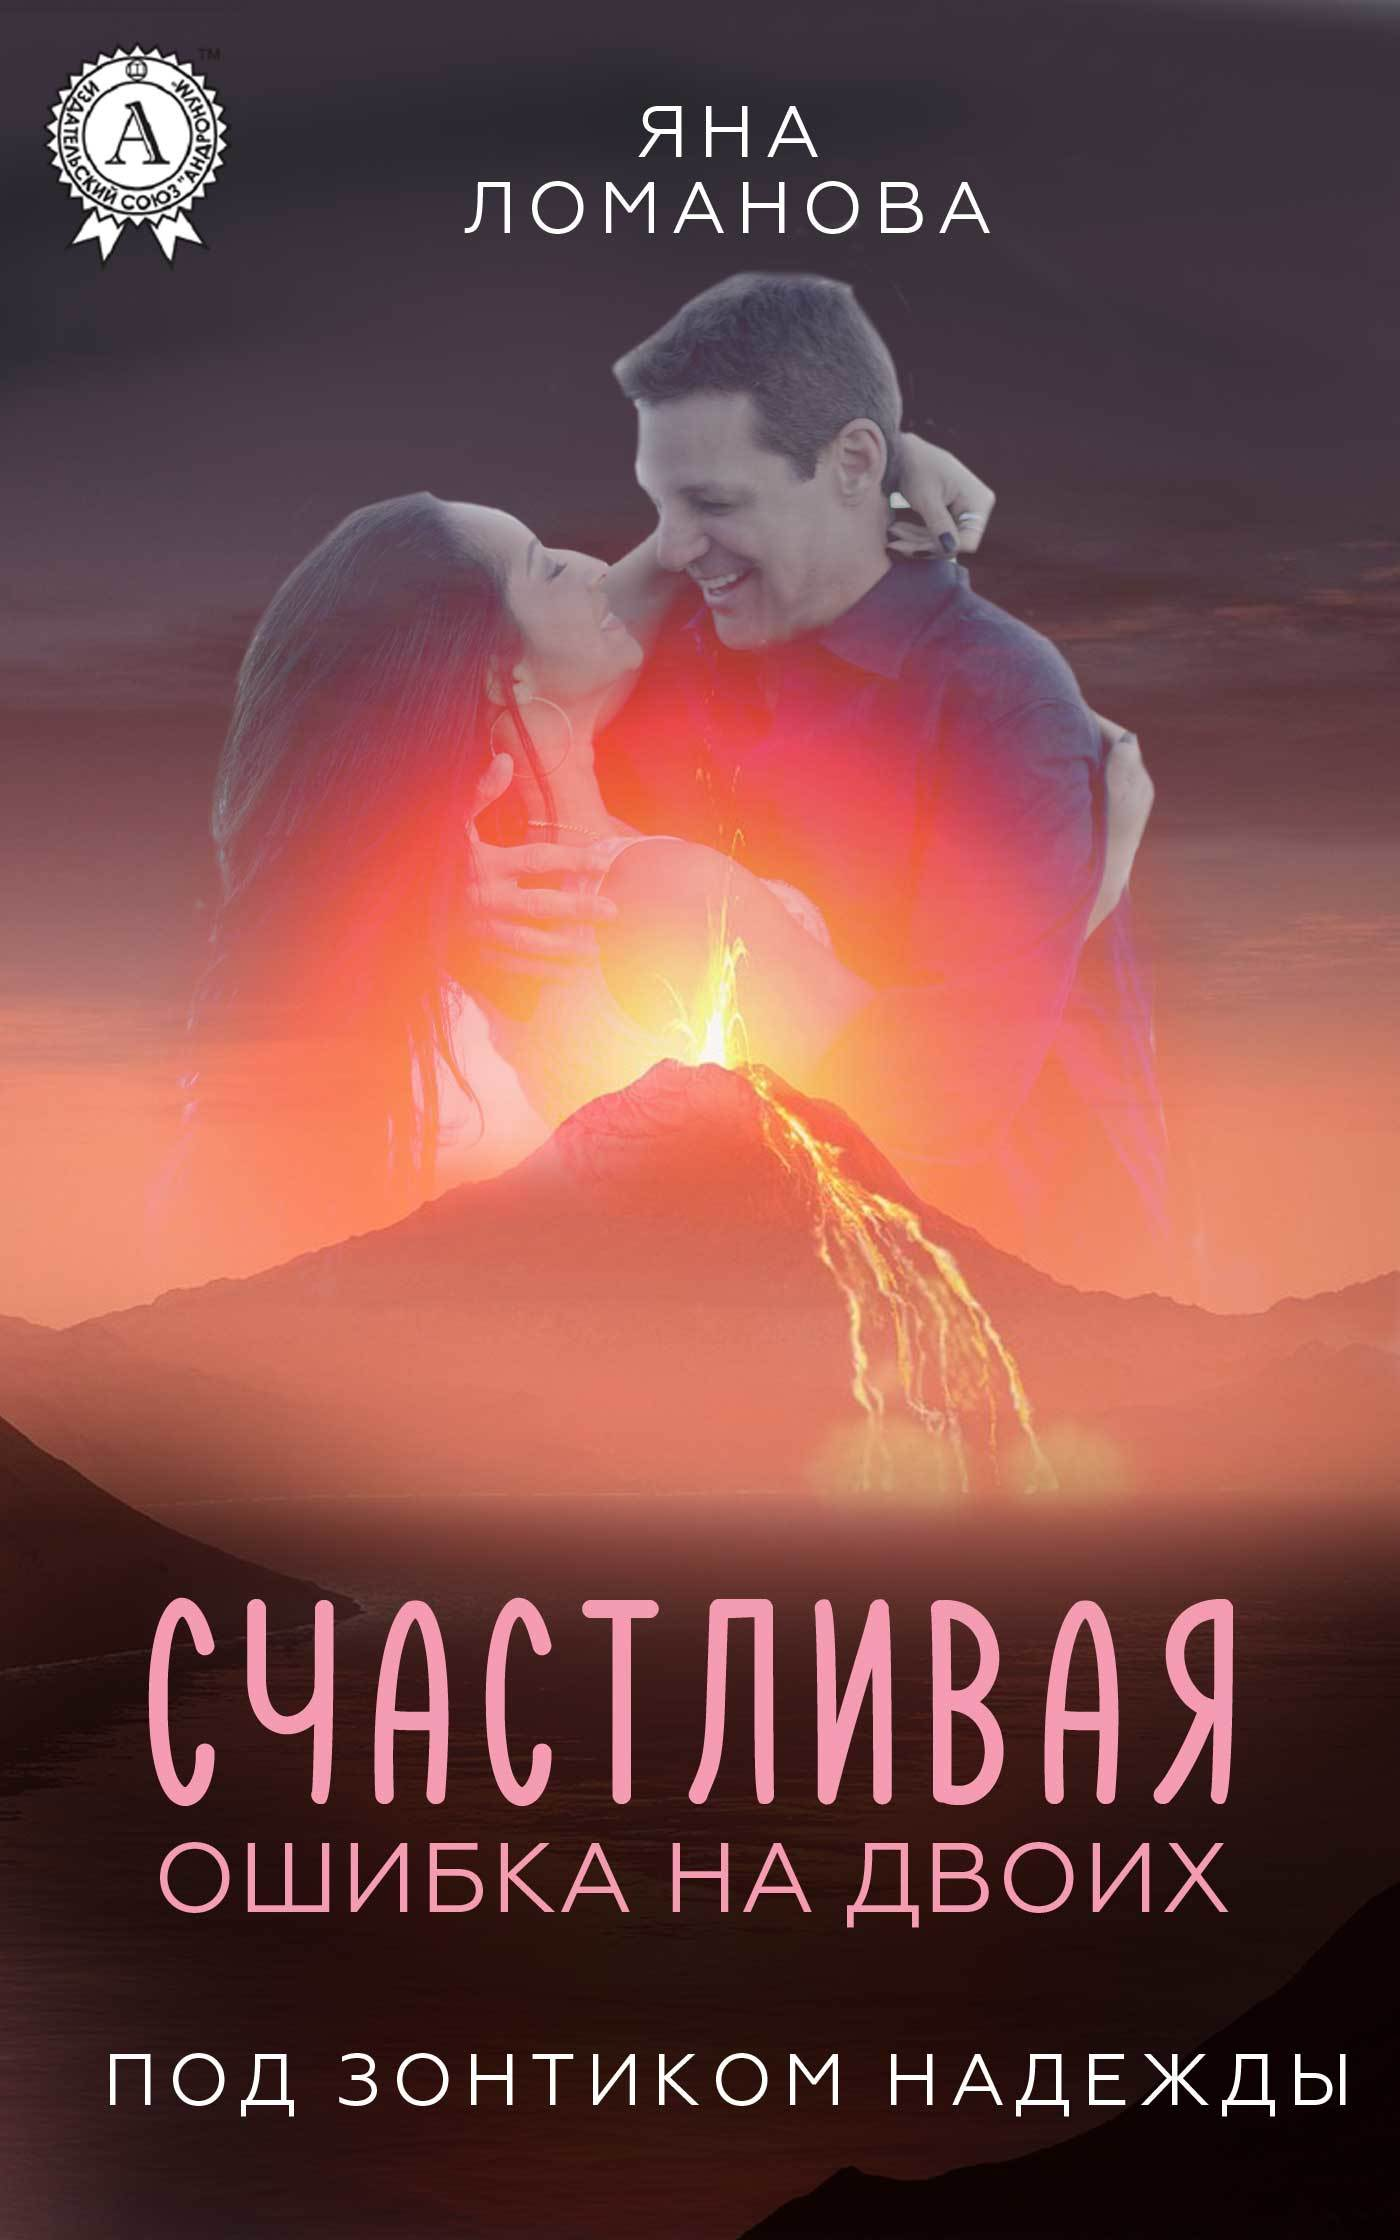 Яна Ломанова Счастливая ошибка на двоих